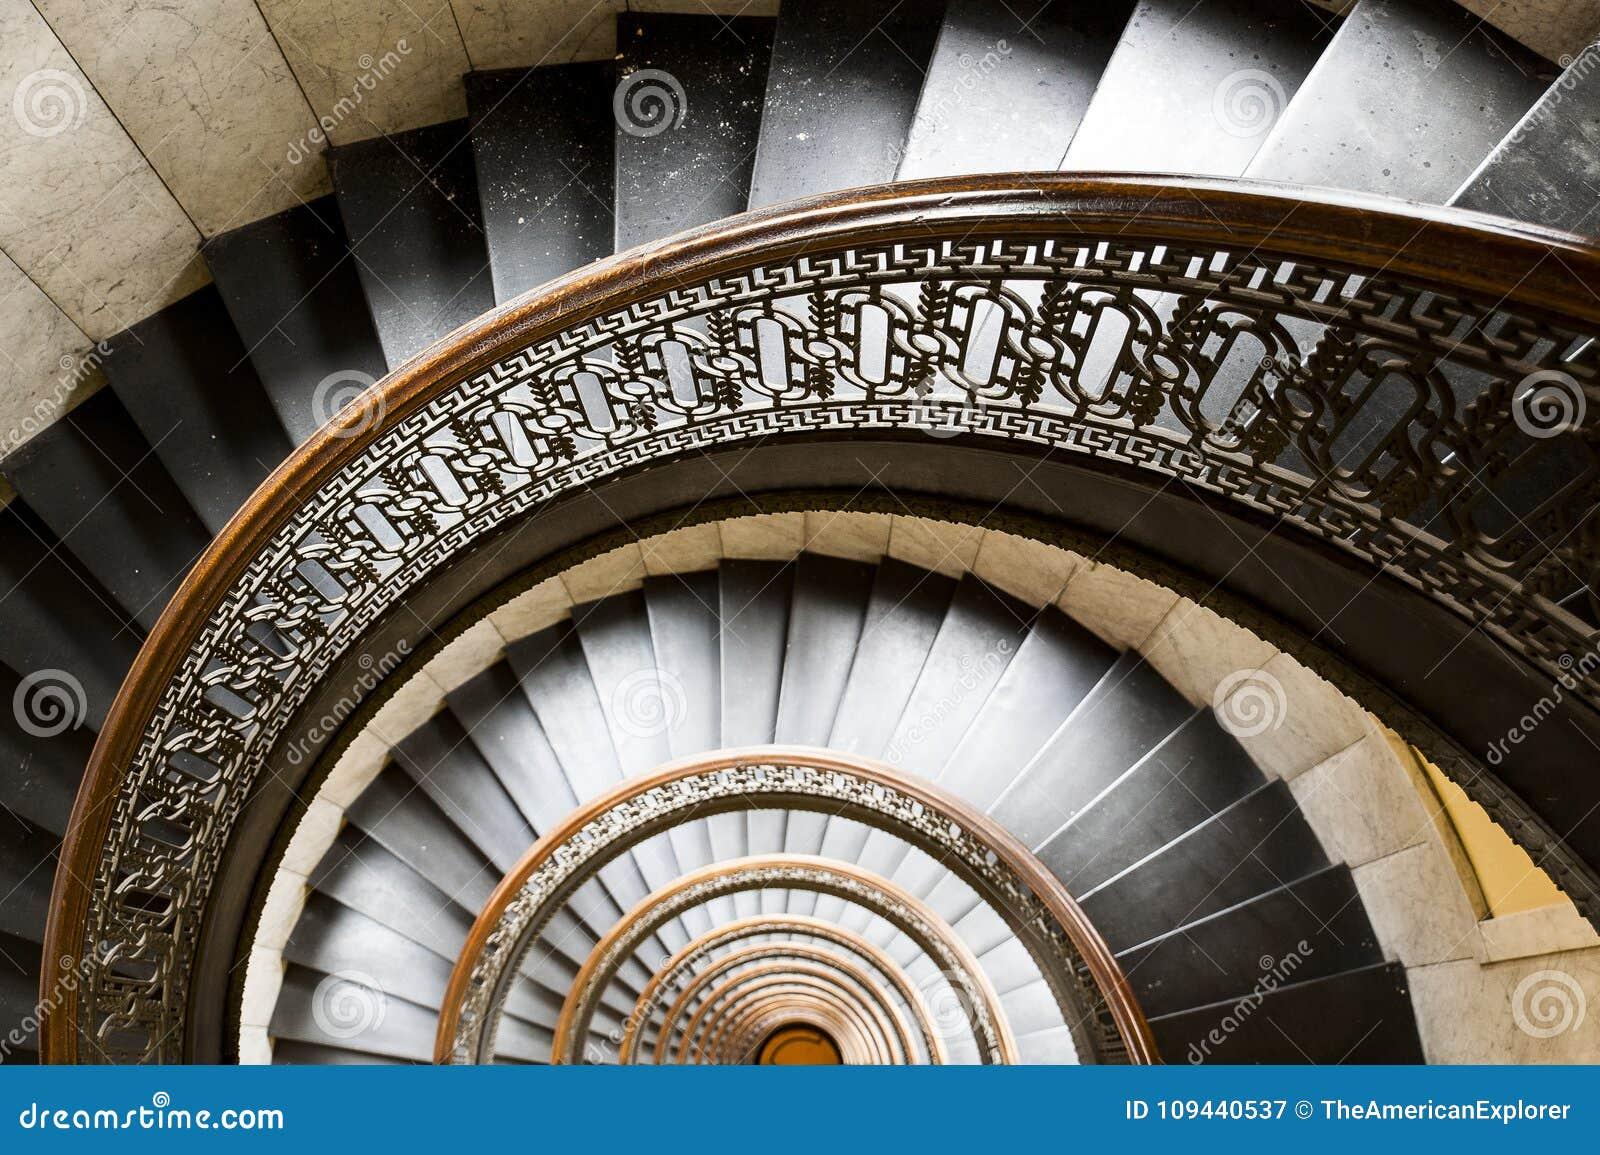 Arrott Building - Half Circular Spiral Marble Staircase - Downtown Pittsburgh, Pennsylvania